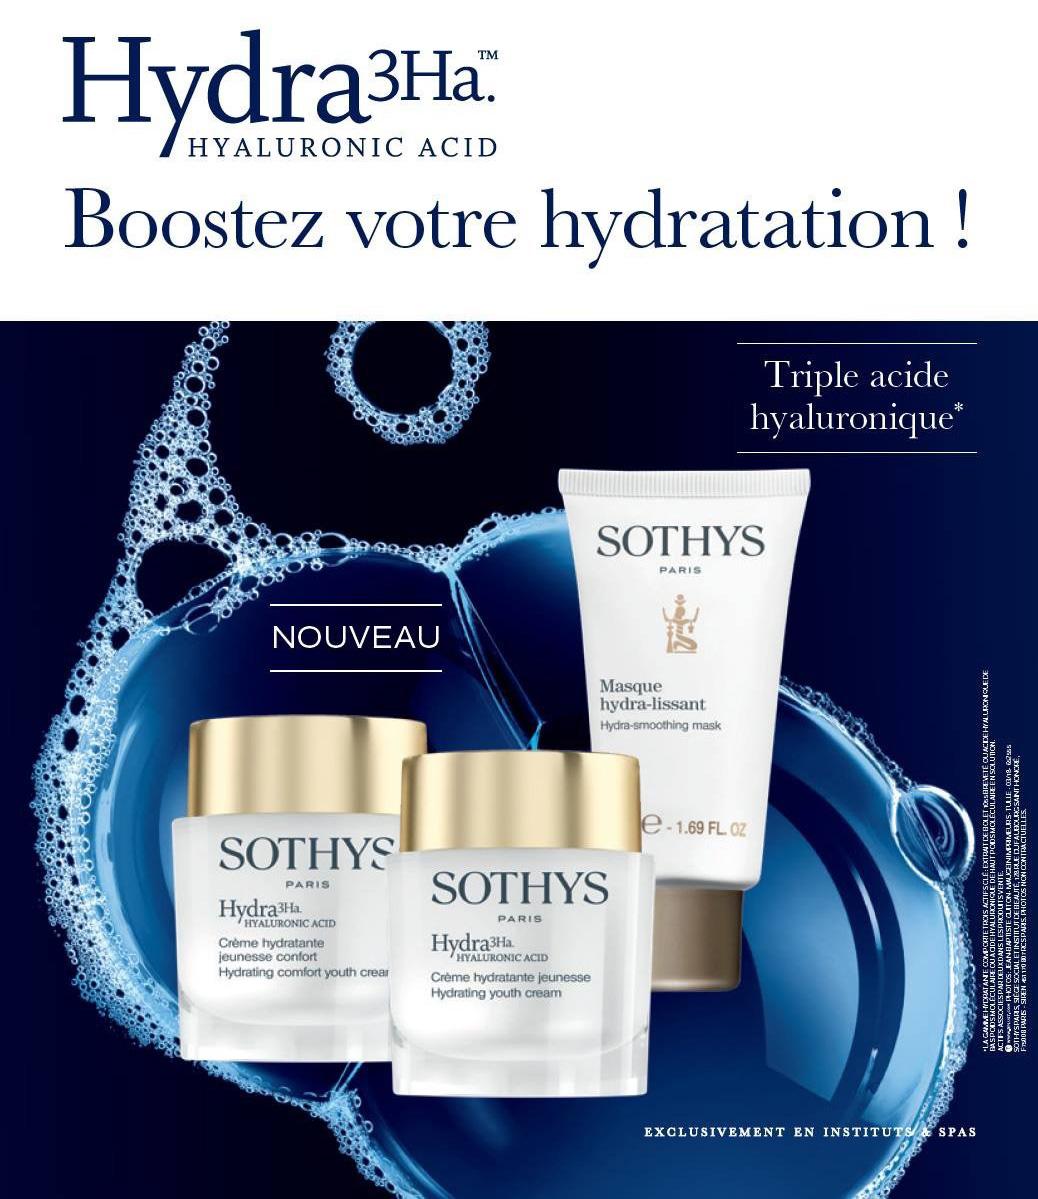 Hydra3Ha - Boostez votre hydratation!